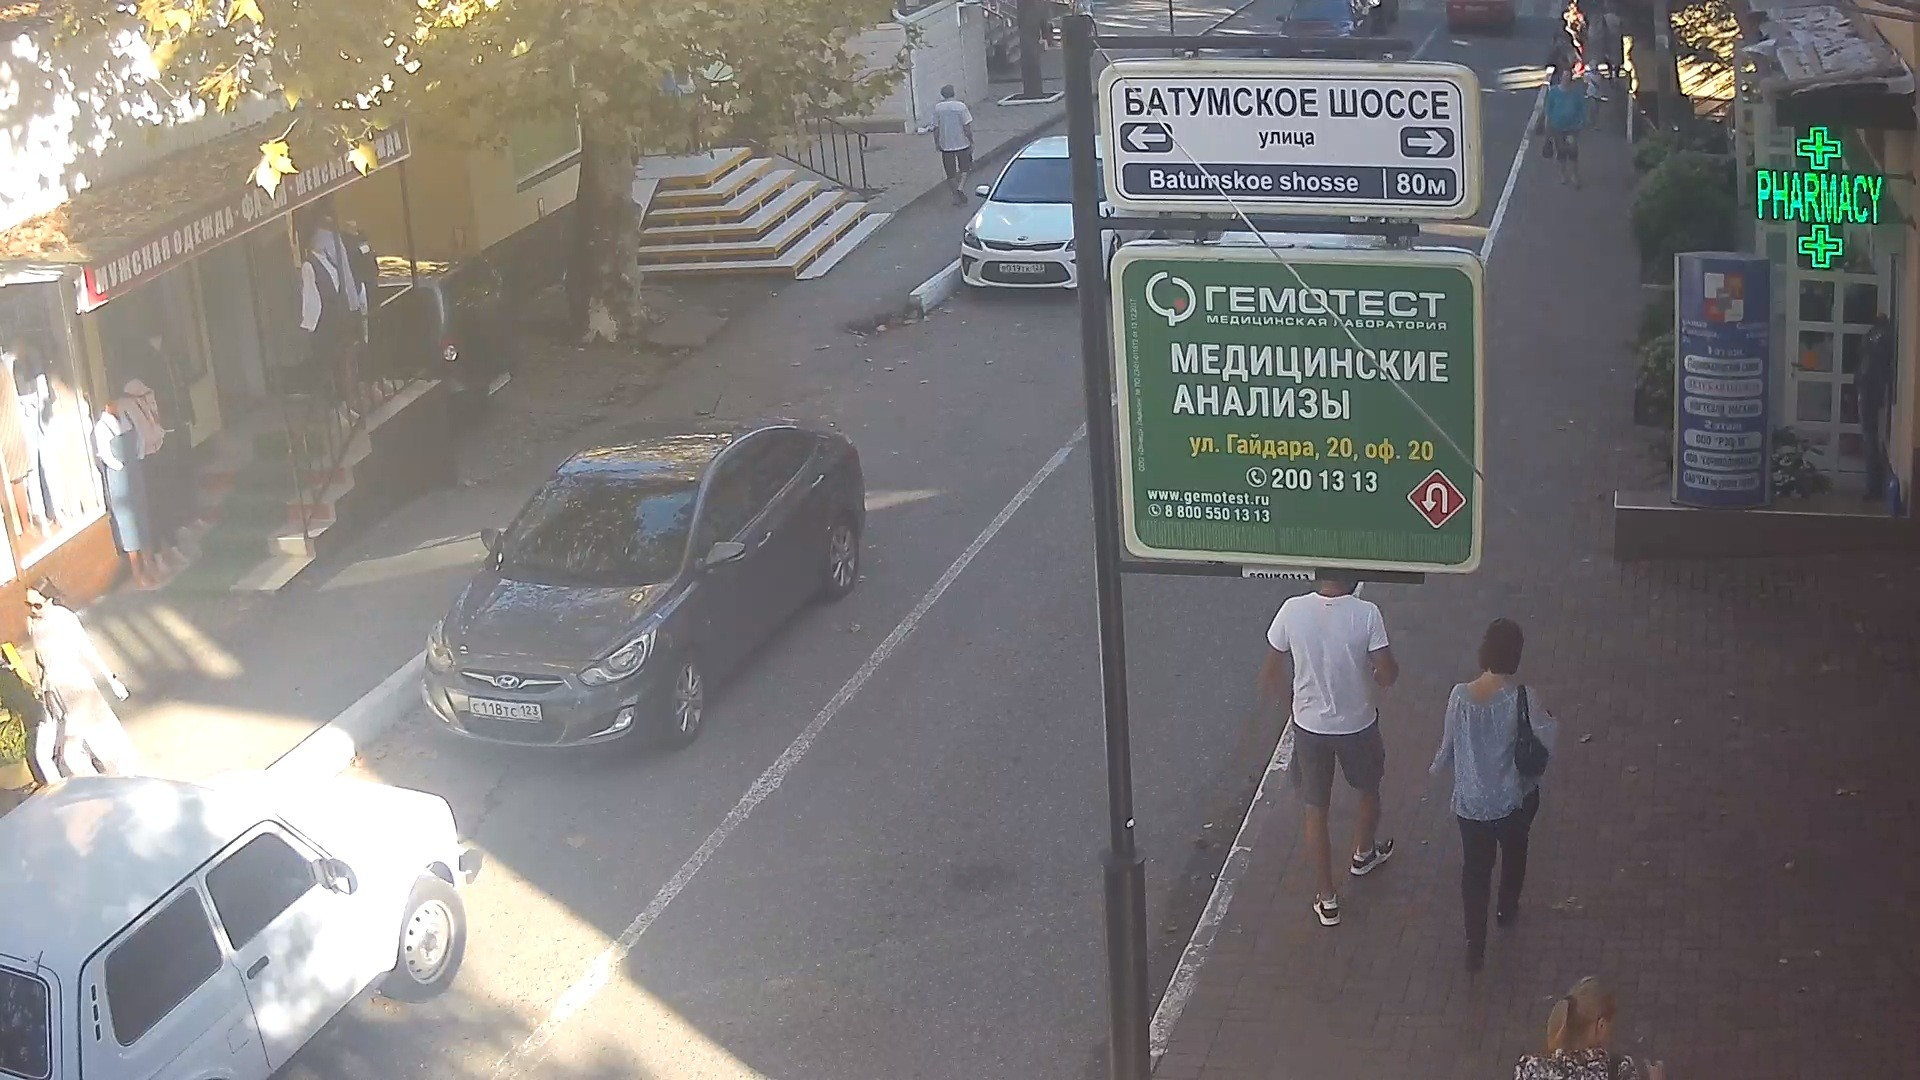 Вебкамера в Дагомысе на ул. Гайдара, выезд